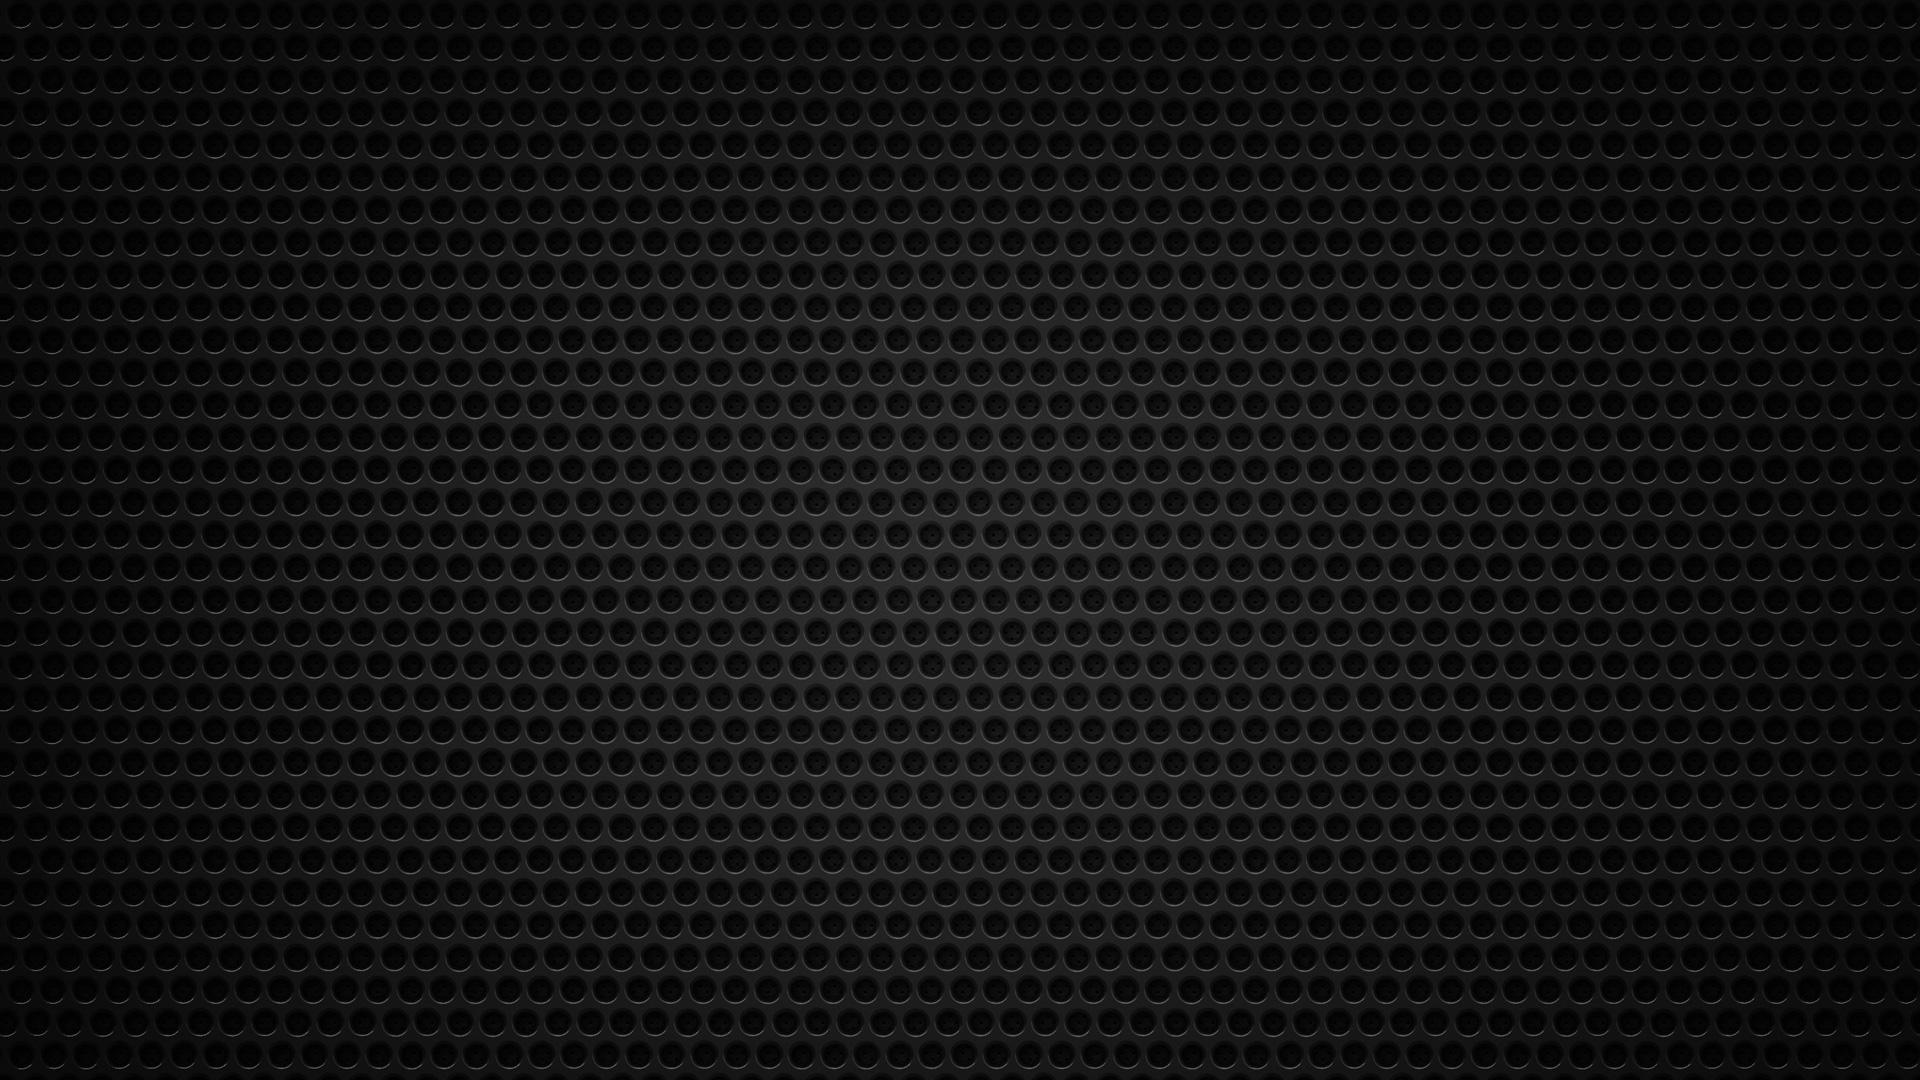 Websites, web design, website, SEO, social media branding, design, branding, web, brand, website designer, business, website development, great websites, web design services, responsive web design, custom website design